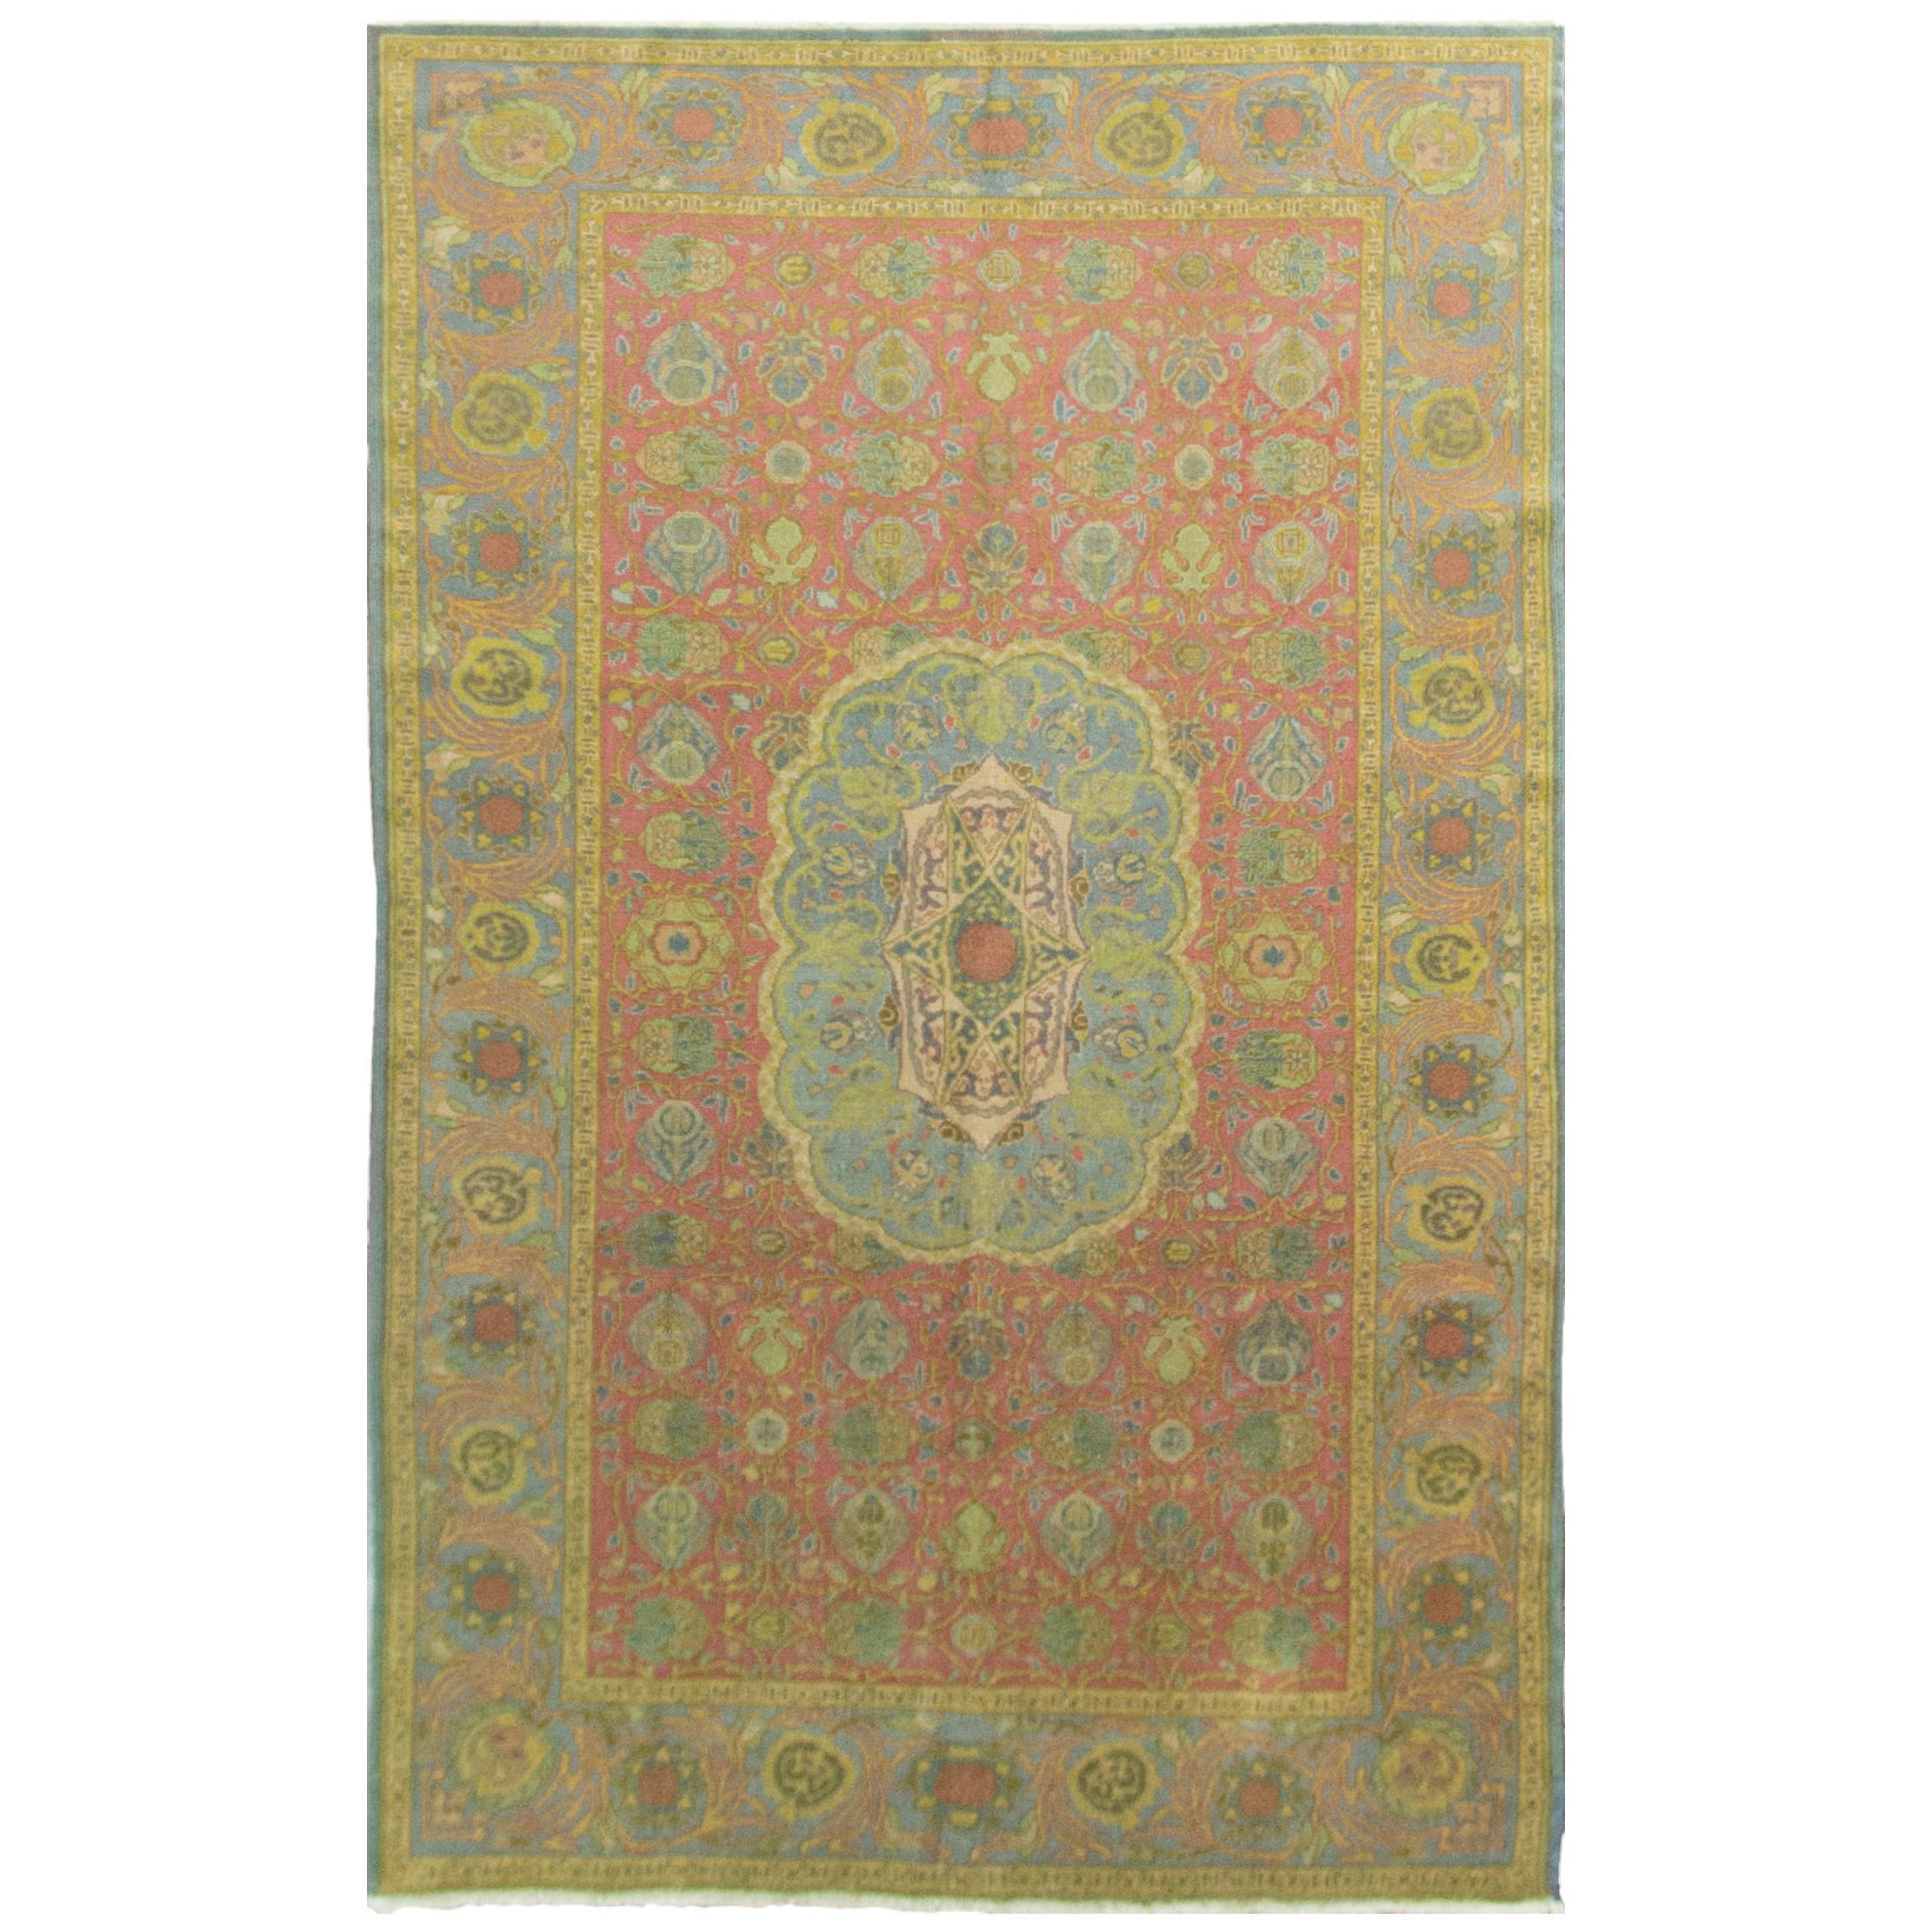 Antique Israeli Bezalel Carpet